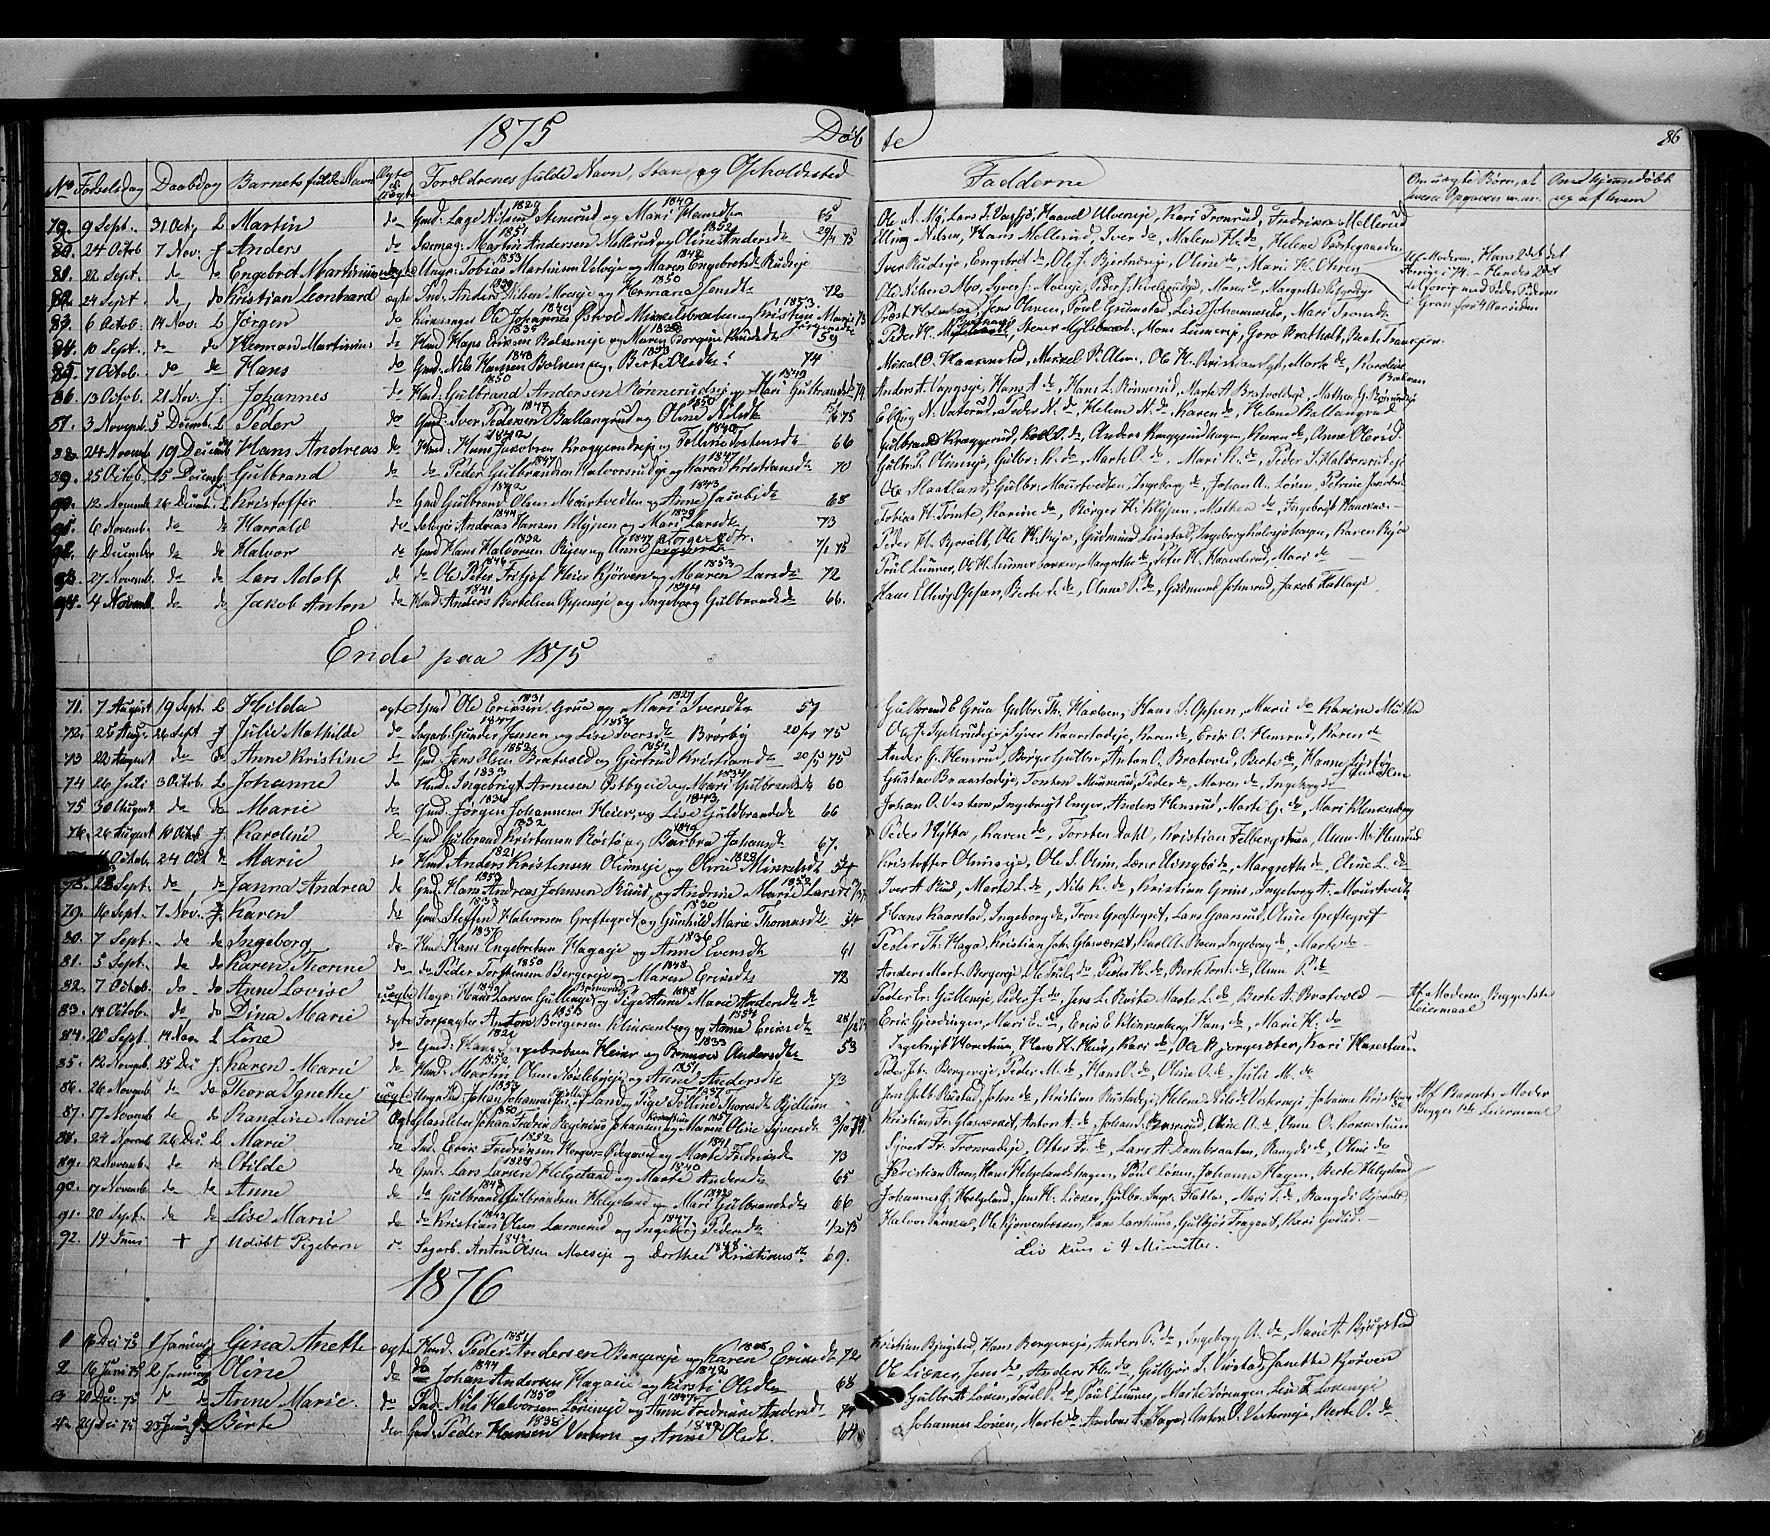 SAH, Jevnaker prestekontor, Ministerialbok nr. 7, 1858-1876, s. 86